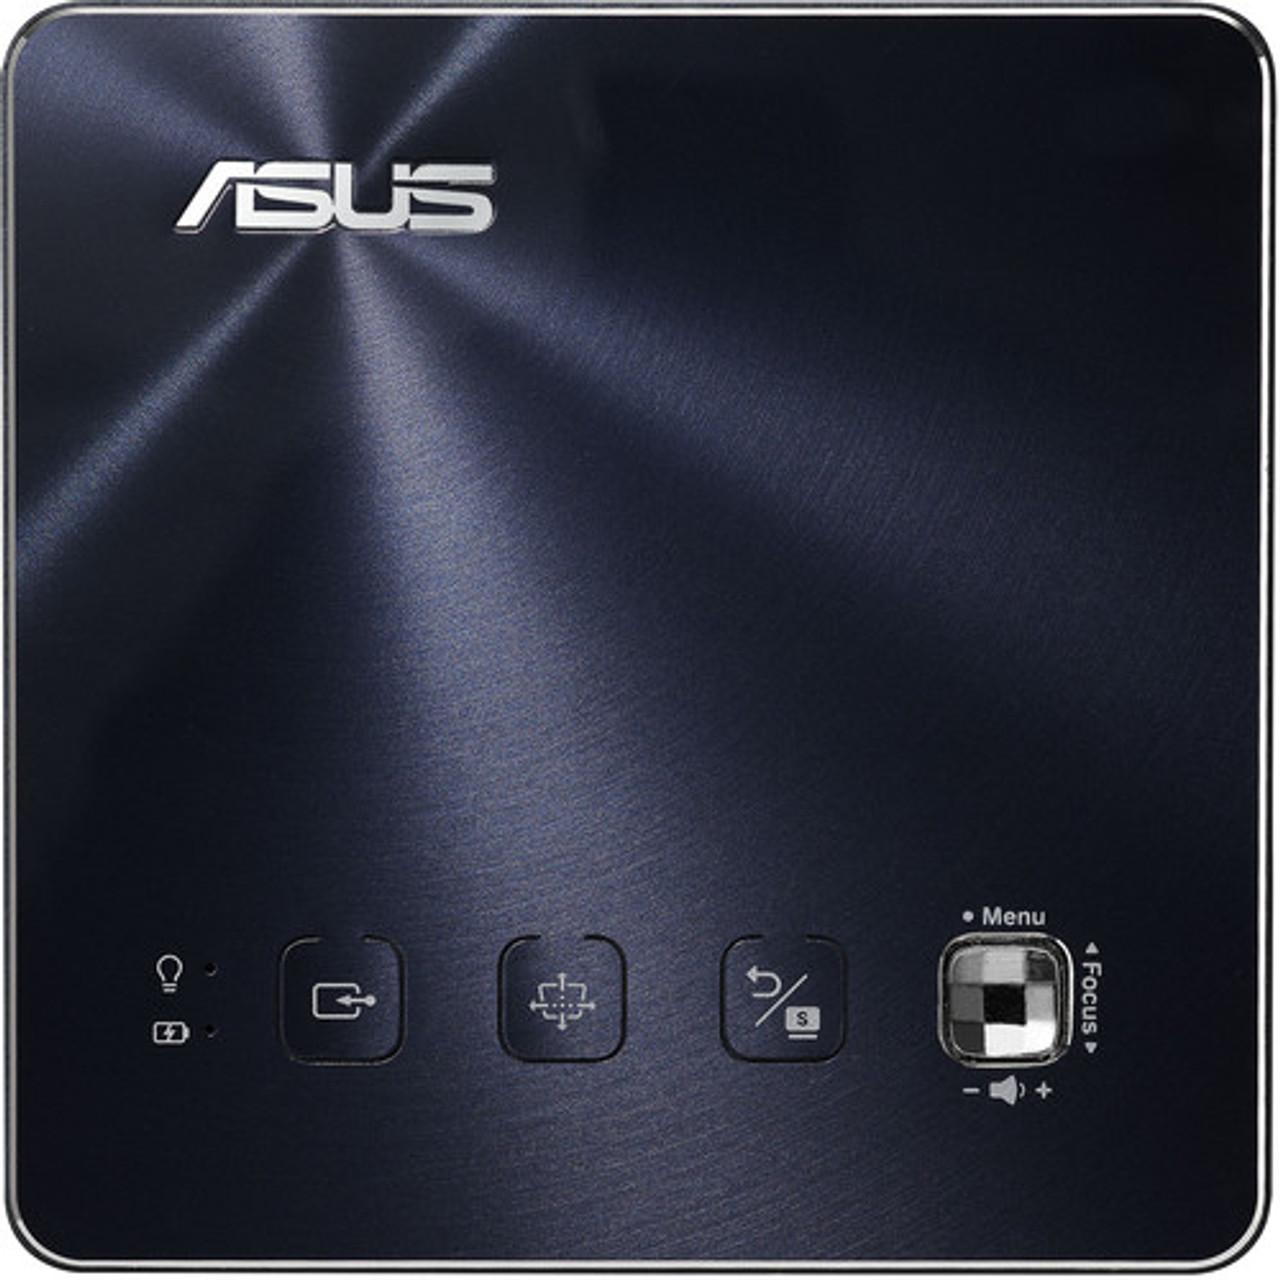 ASUS A90LJ00C0-B00540-R ZenBeam S2 Portable DLP Projector - Certified Refurbished